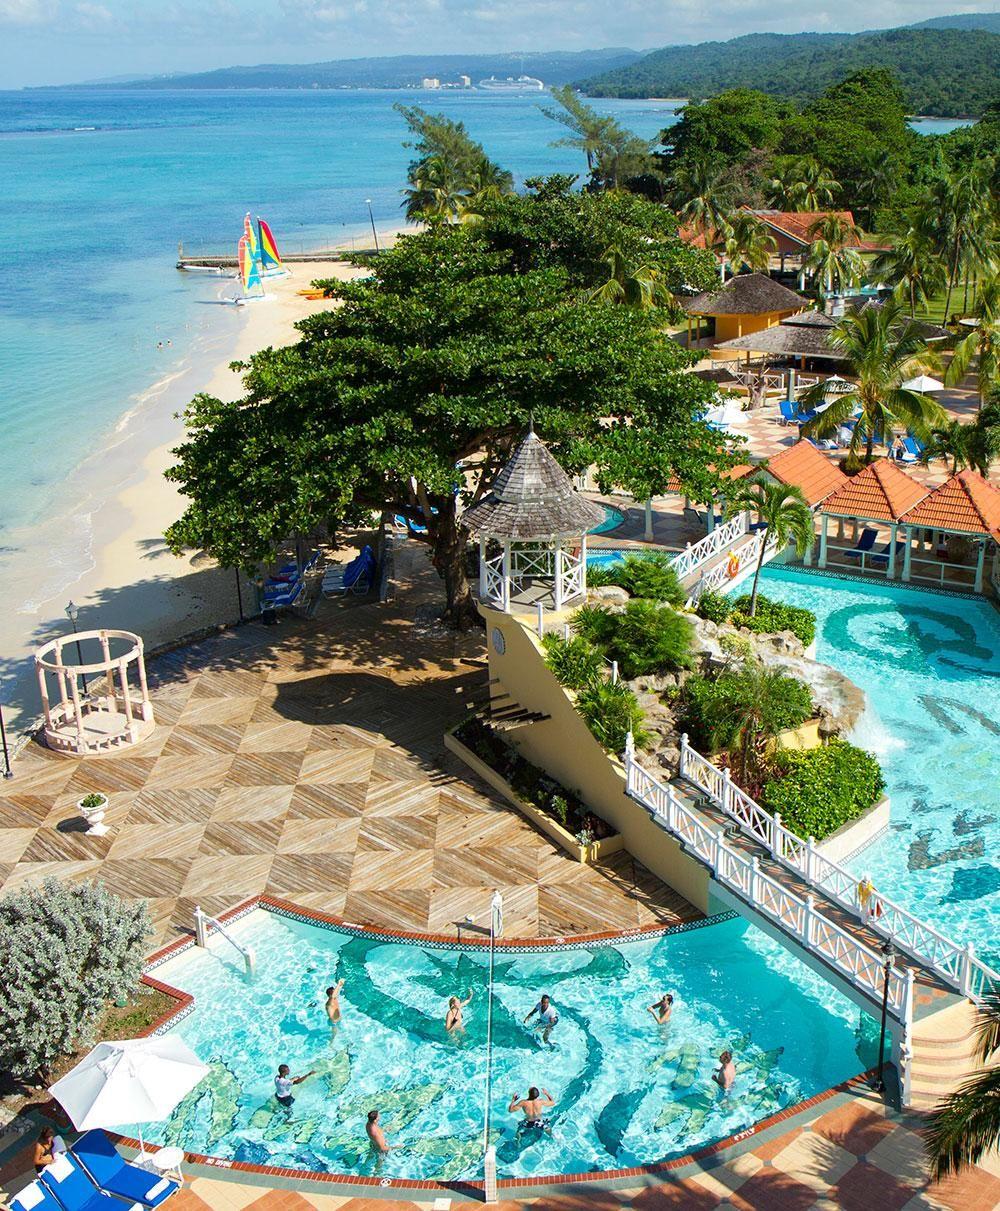 Jewel Dunn's River Beach Resort & Spa, Ocho Rios Jamaica